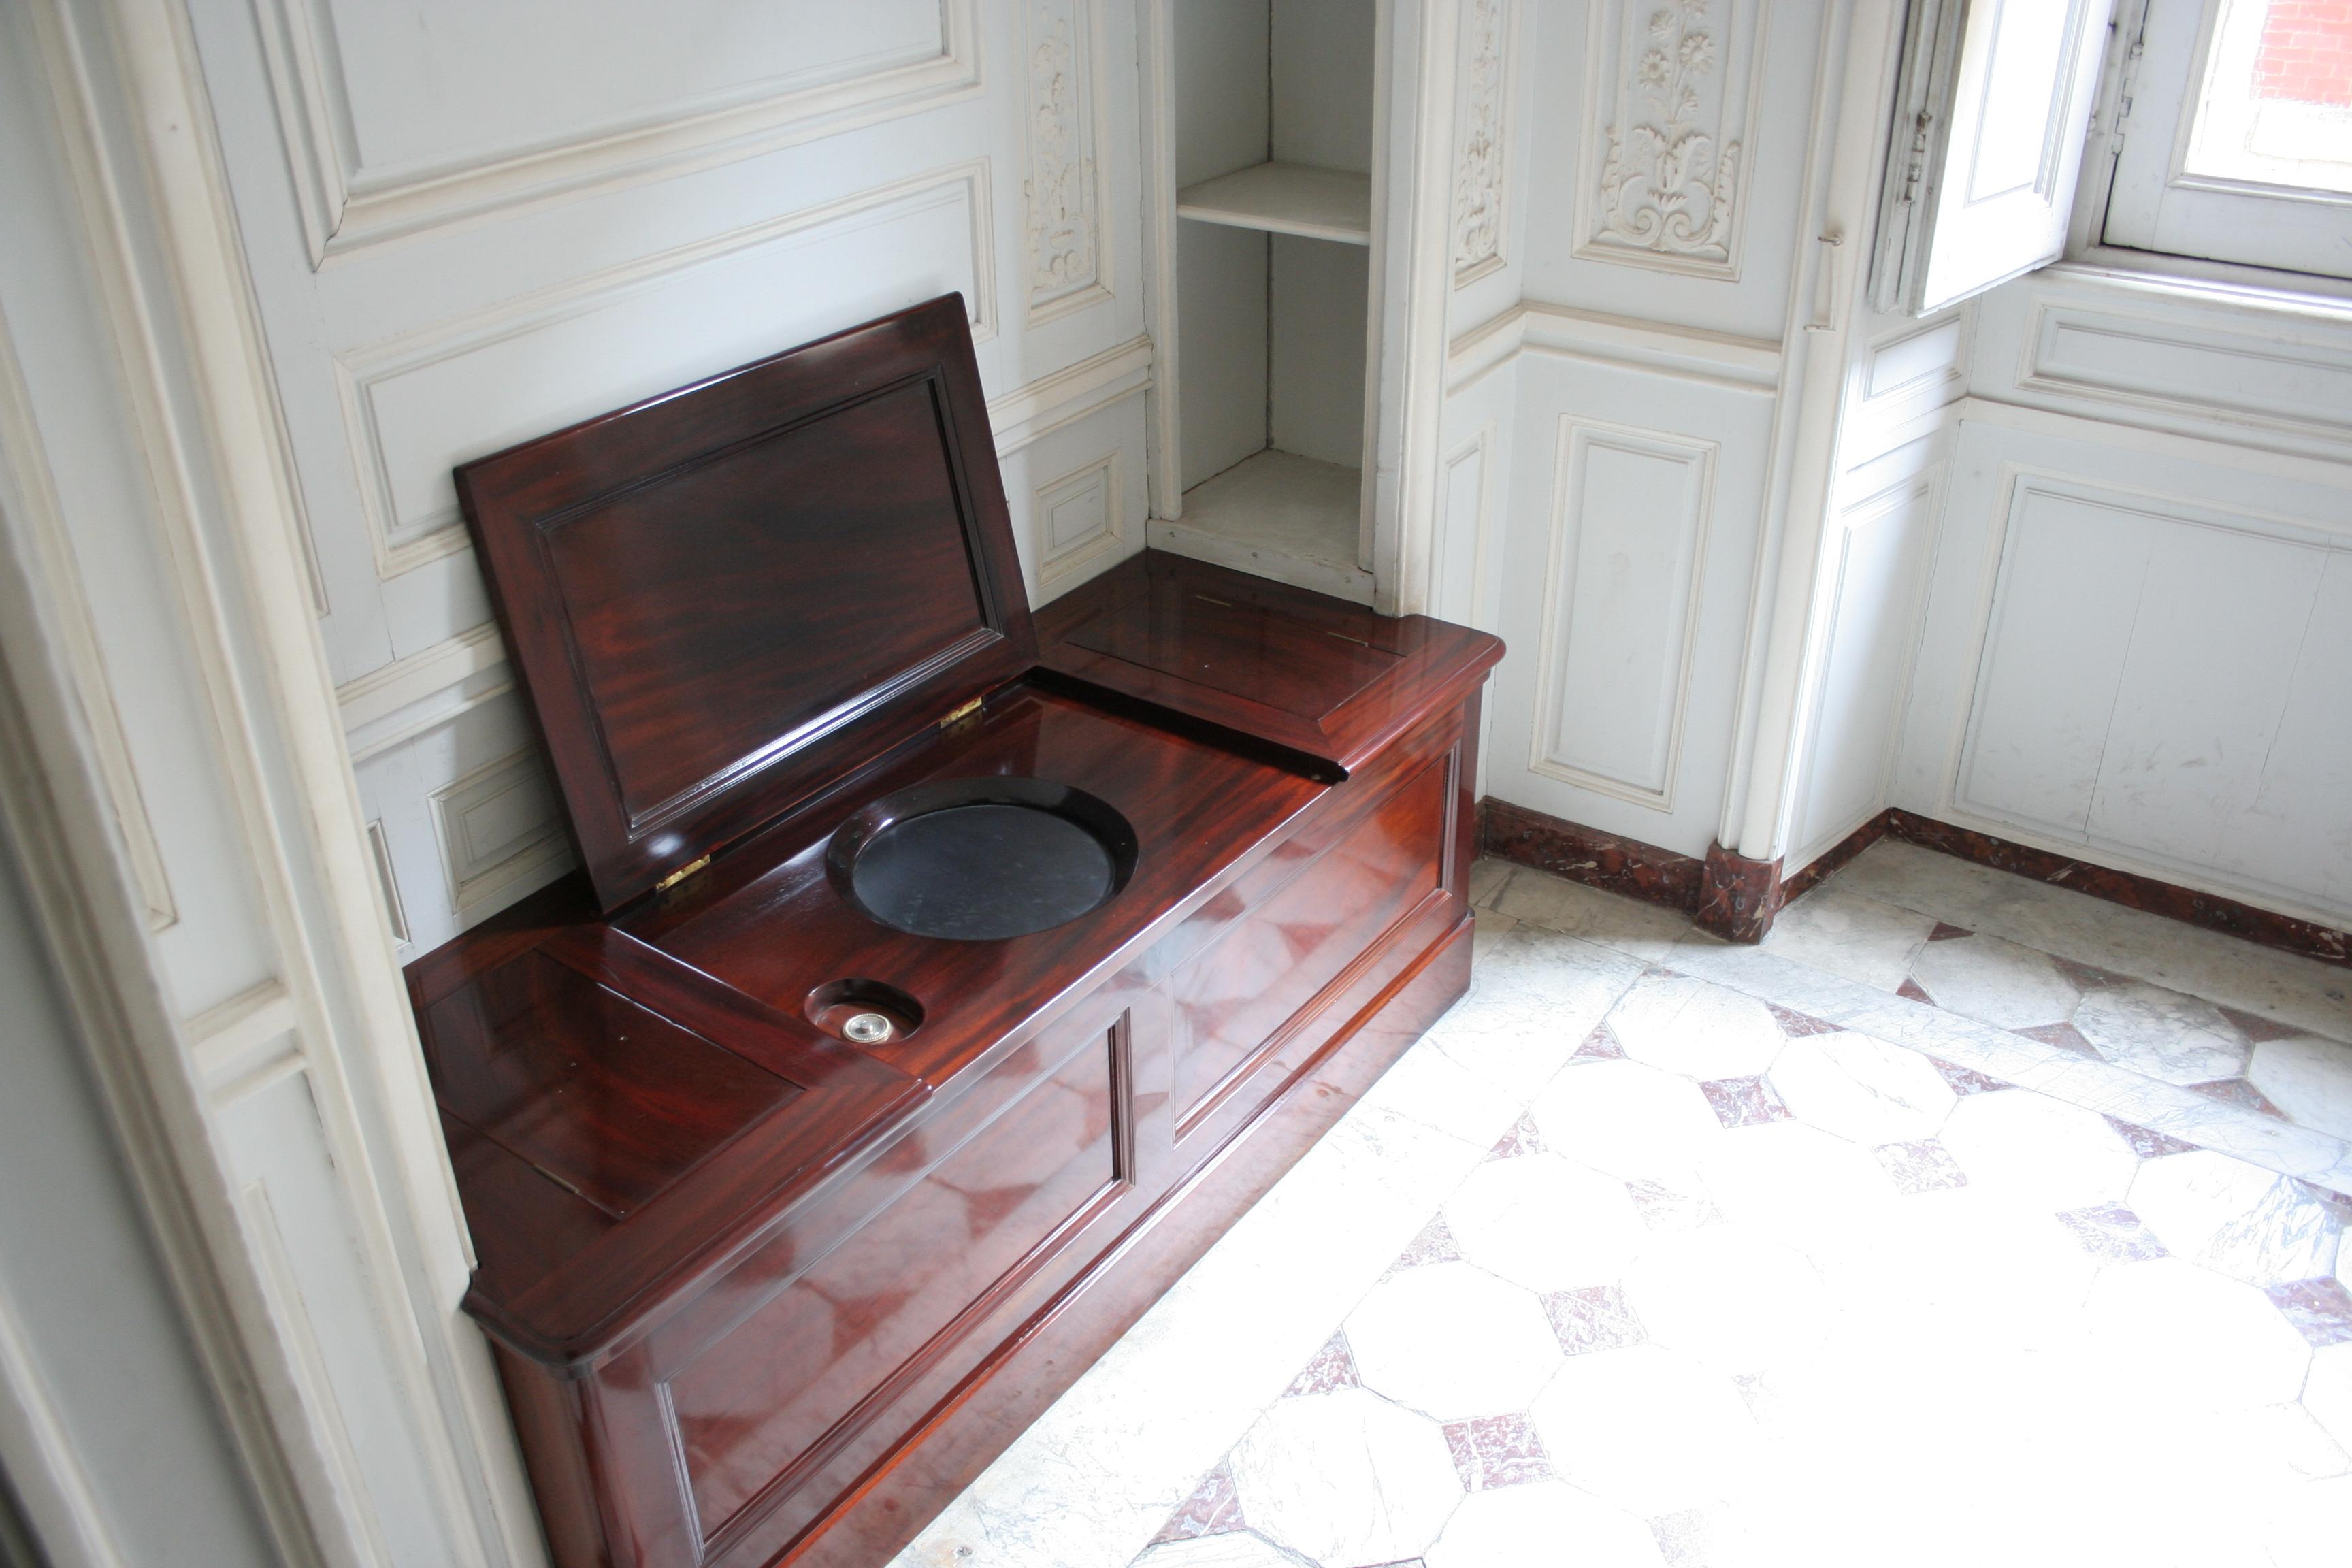 file versailles appartements de marie antoinette la wikimedia commons. Black Bedroom Furniture Sets. Home Design Ideas